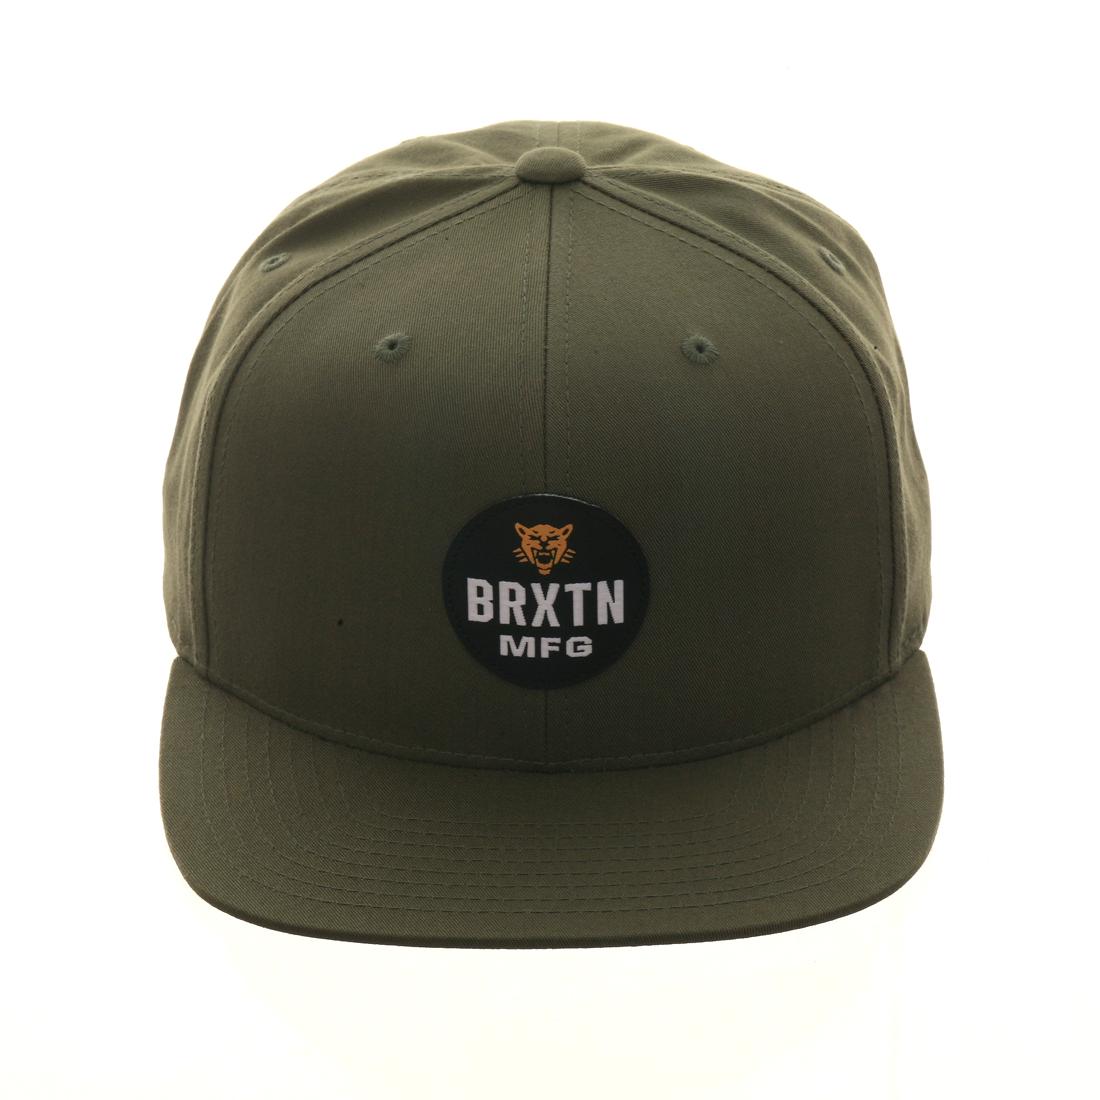 24df8527e05 Brixton Panther Snapback Hat - Olive